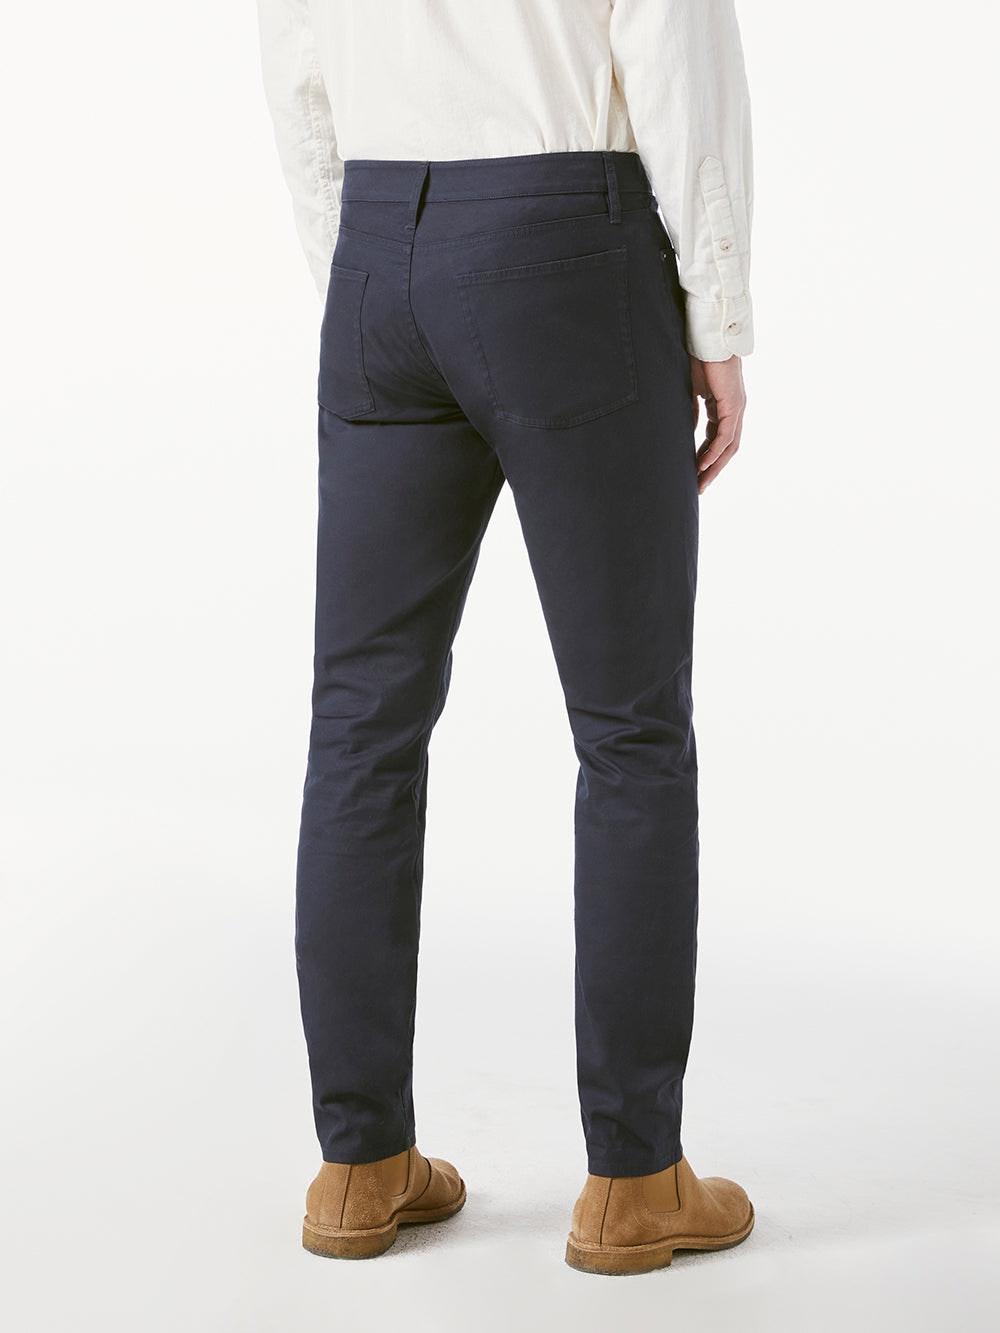 pant back view